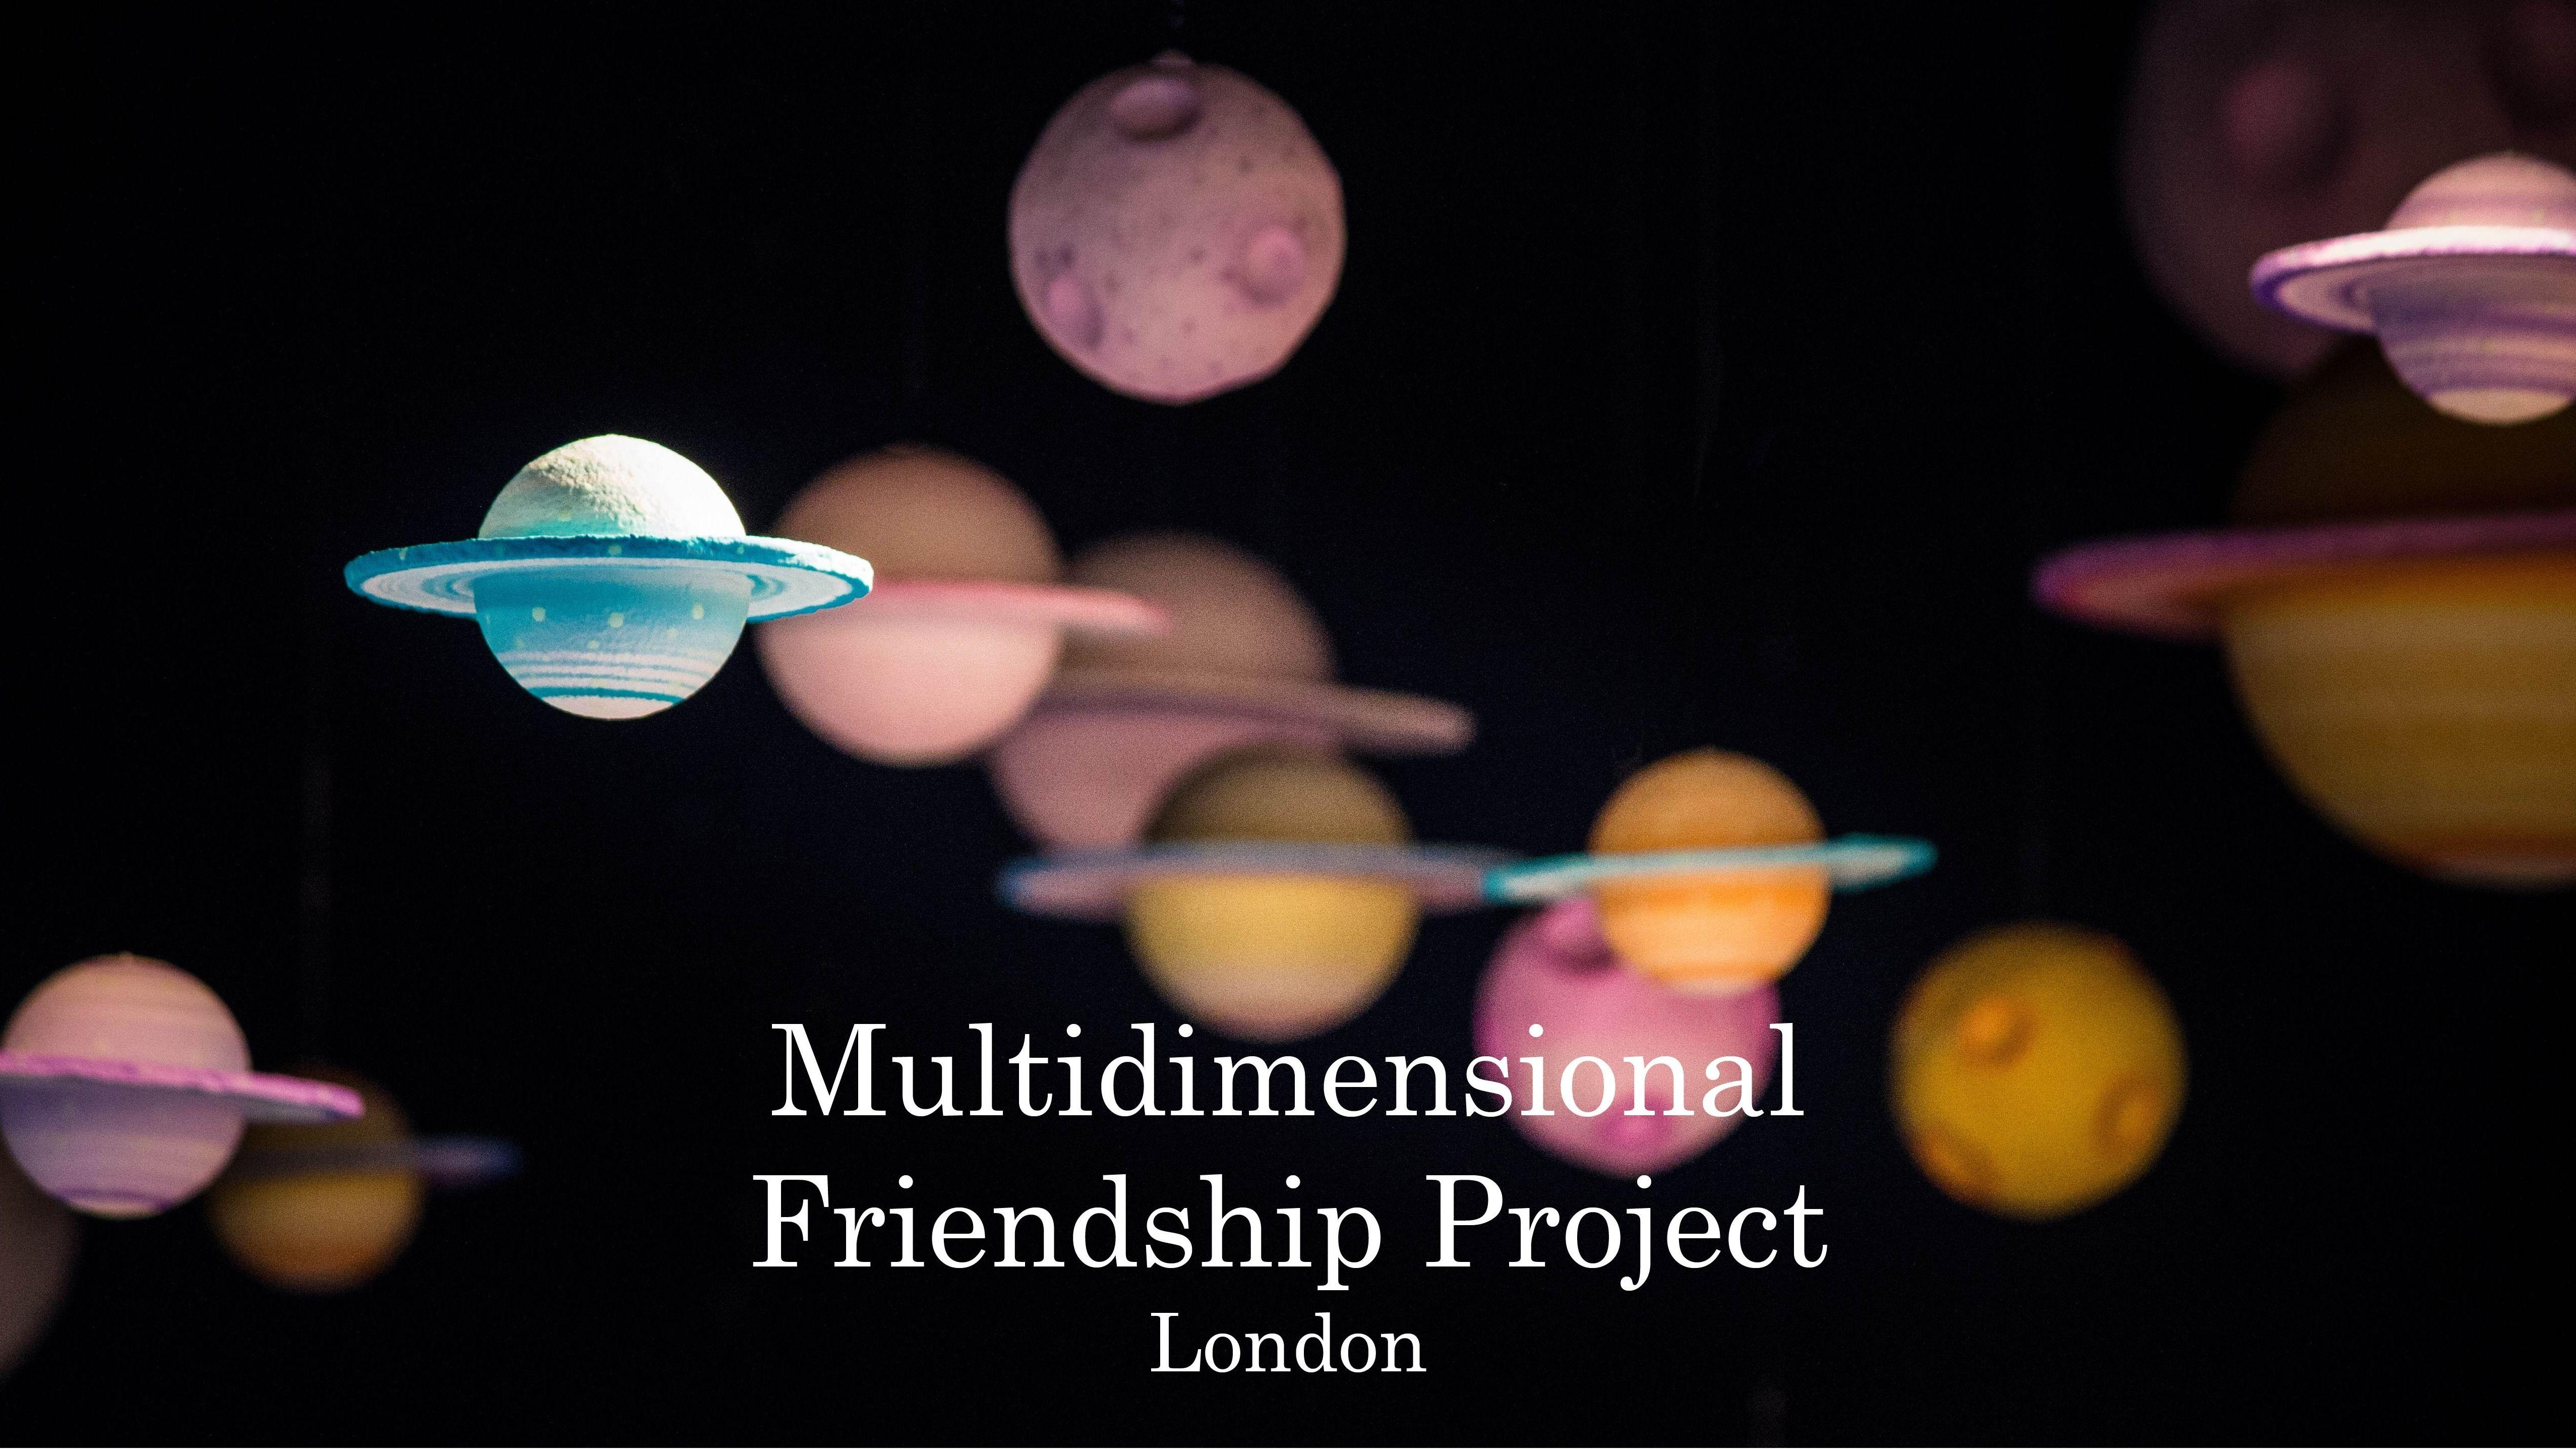 Multidimensional Friendship Project London